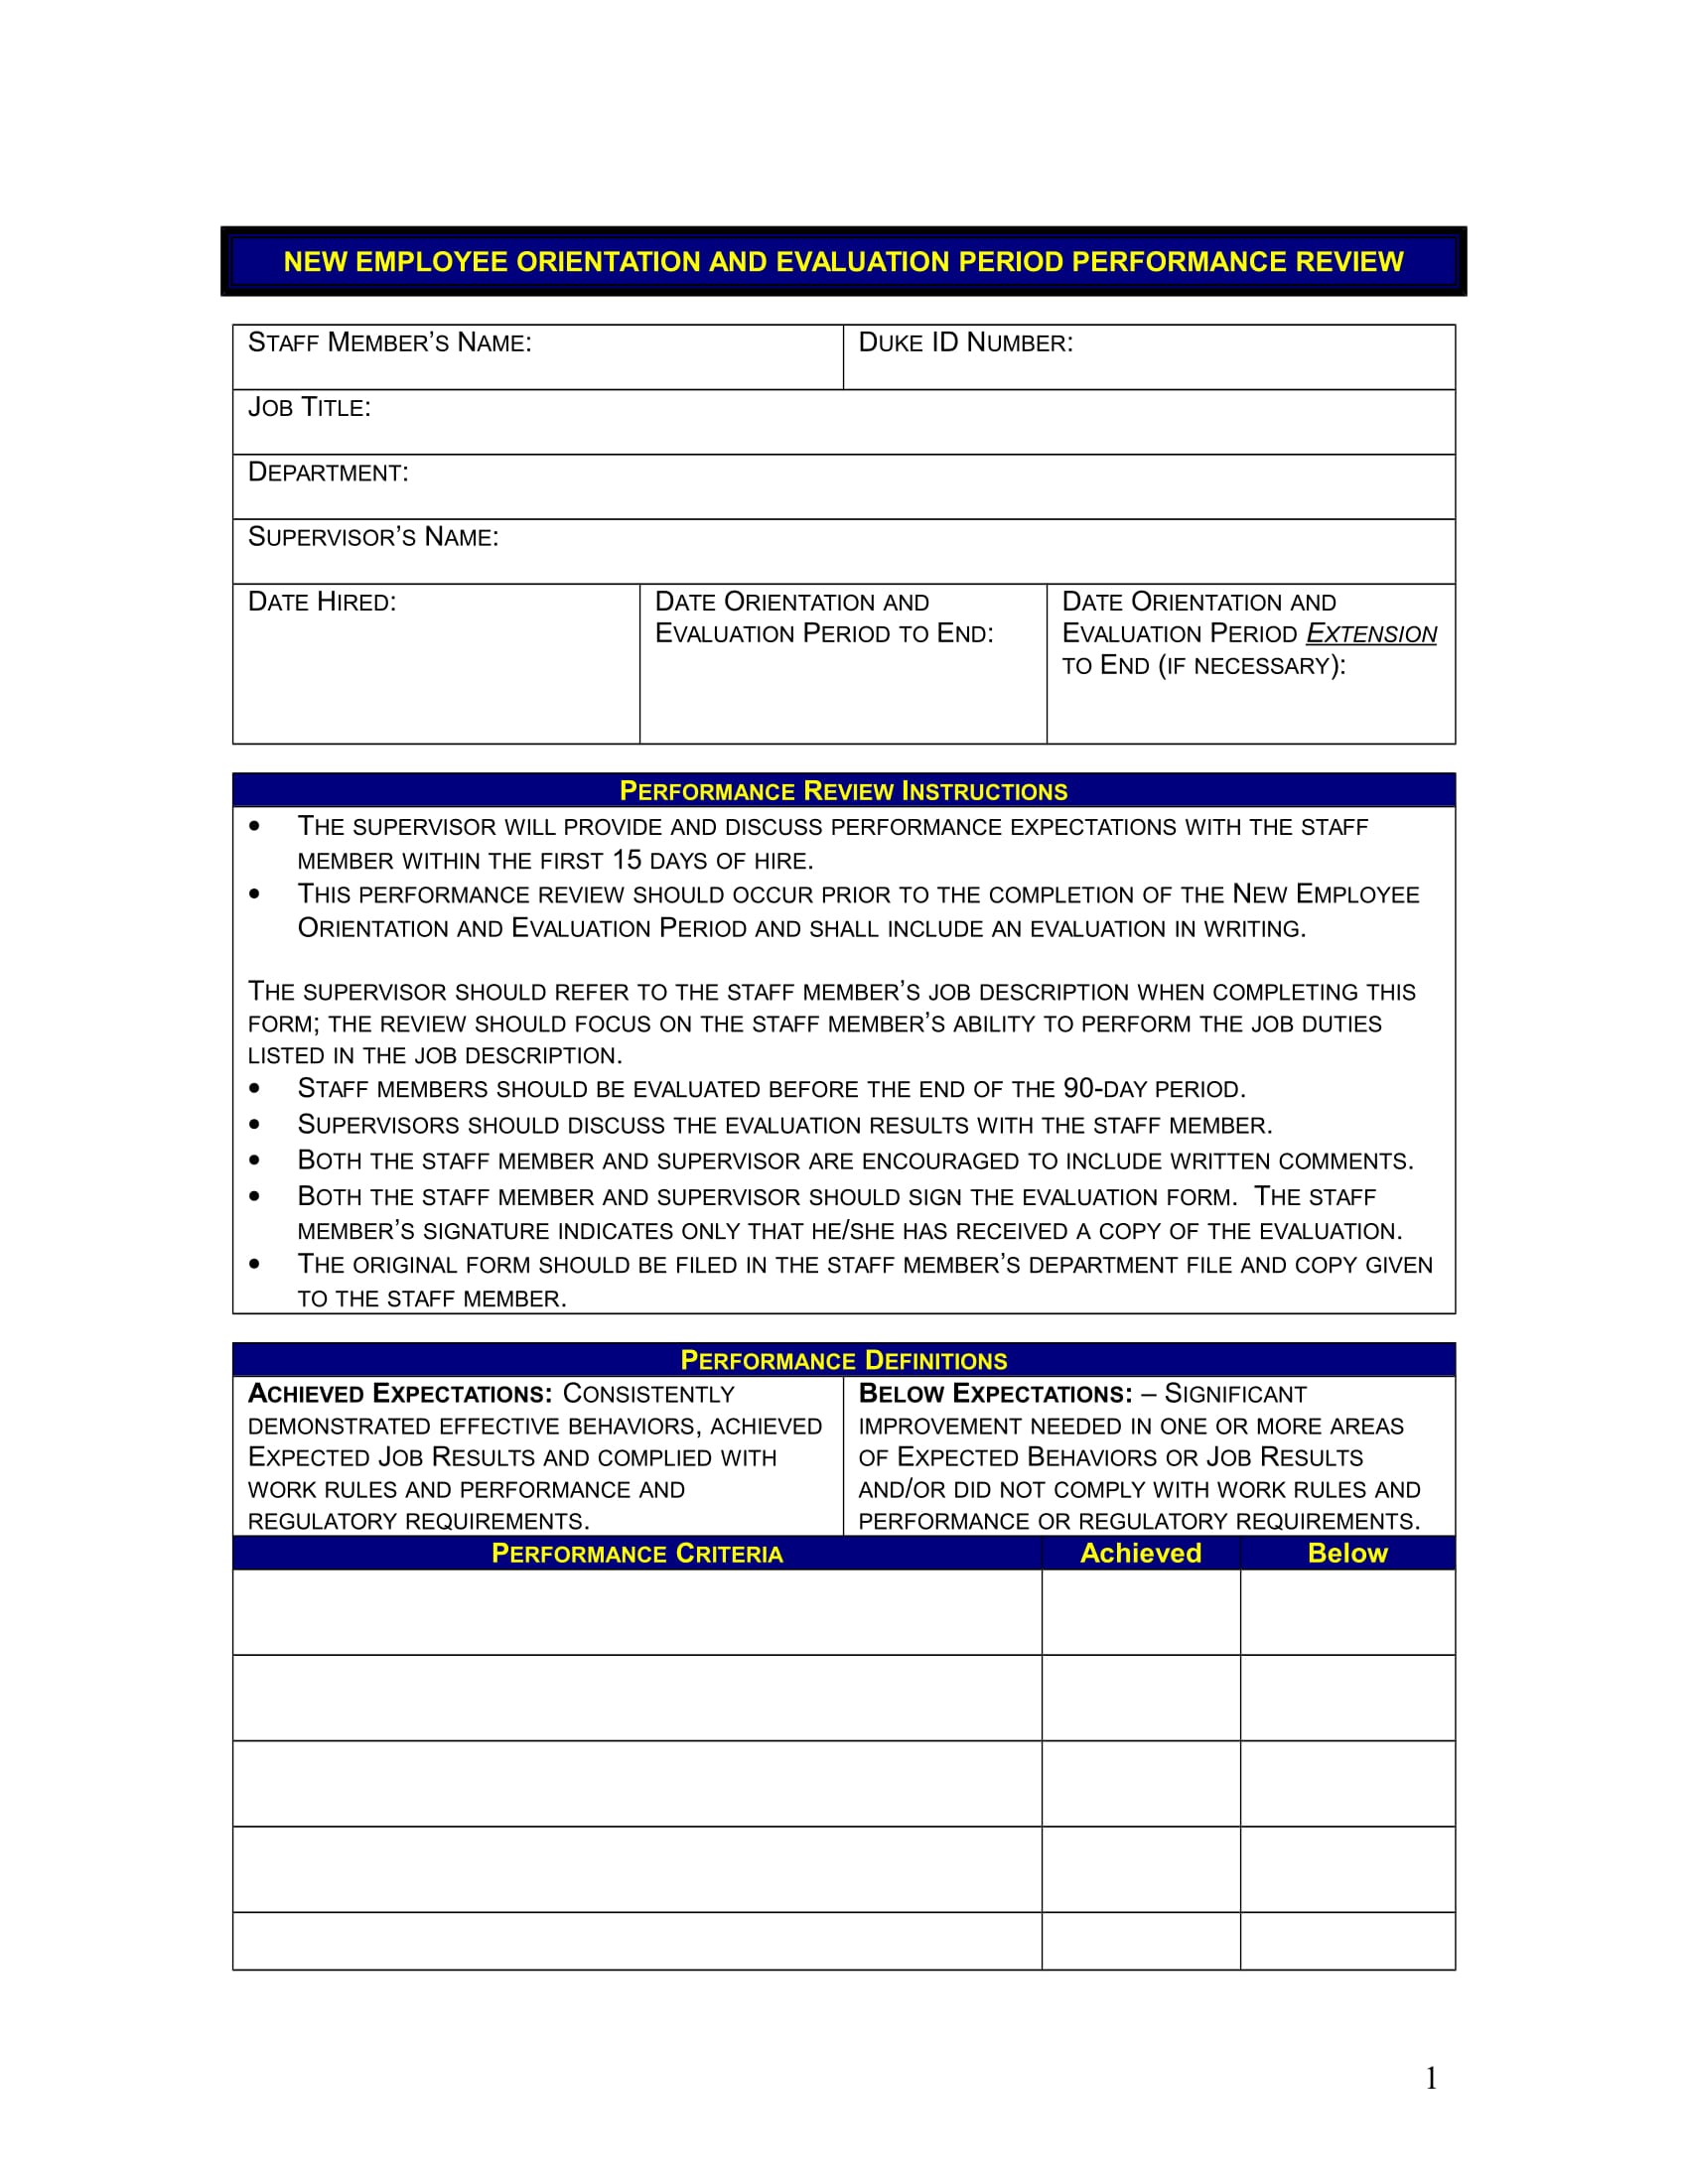 employee evaluation period revew form doc 1